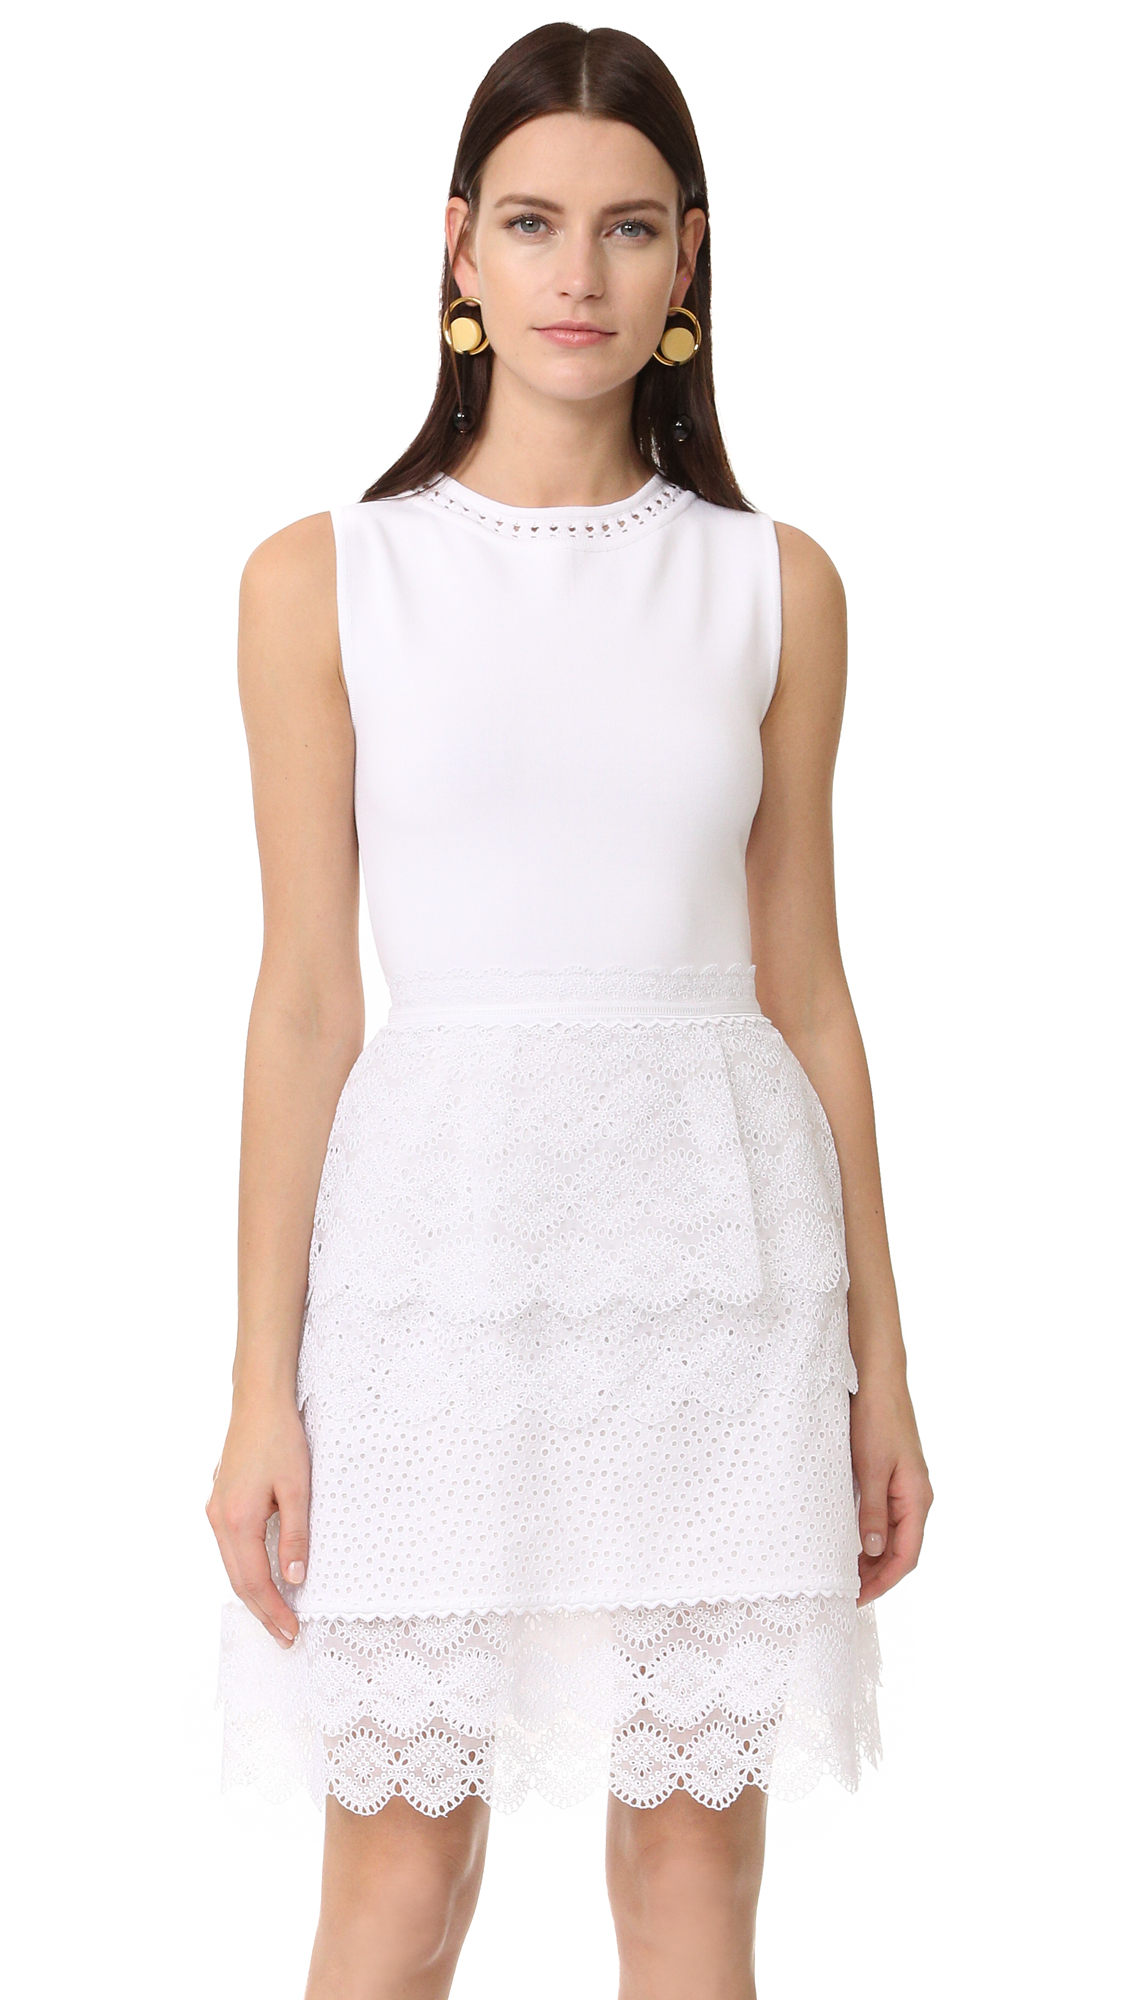 Antonio Berardi Sleeveless Dress - Bianco Ottico at Shopbop